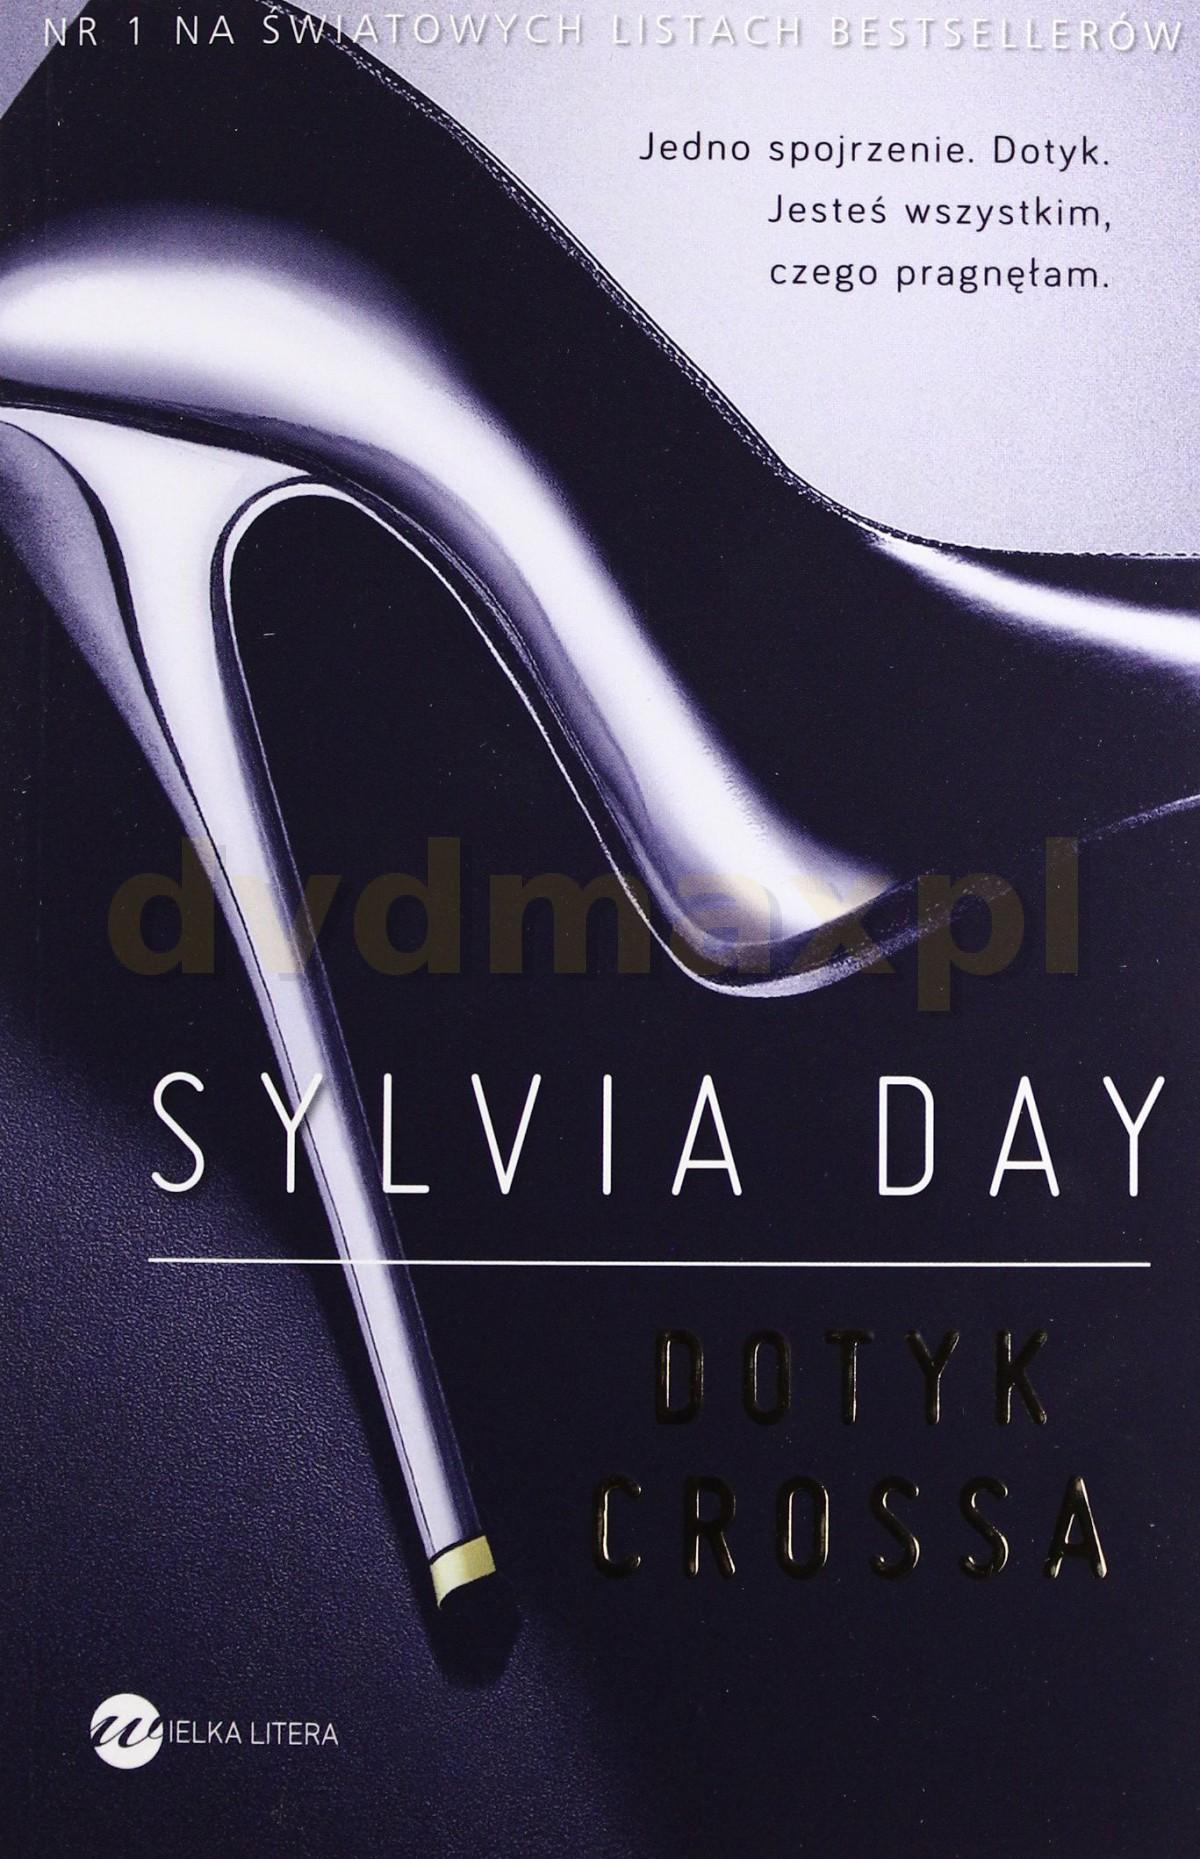 Dotyk Crossa - Sylvia Day [KSIĄŻKA] - Day Sylvia